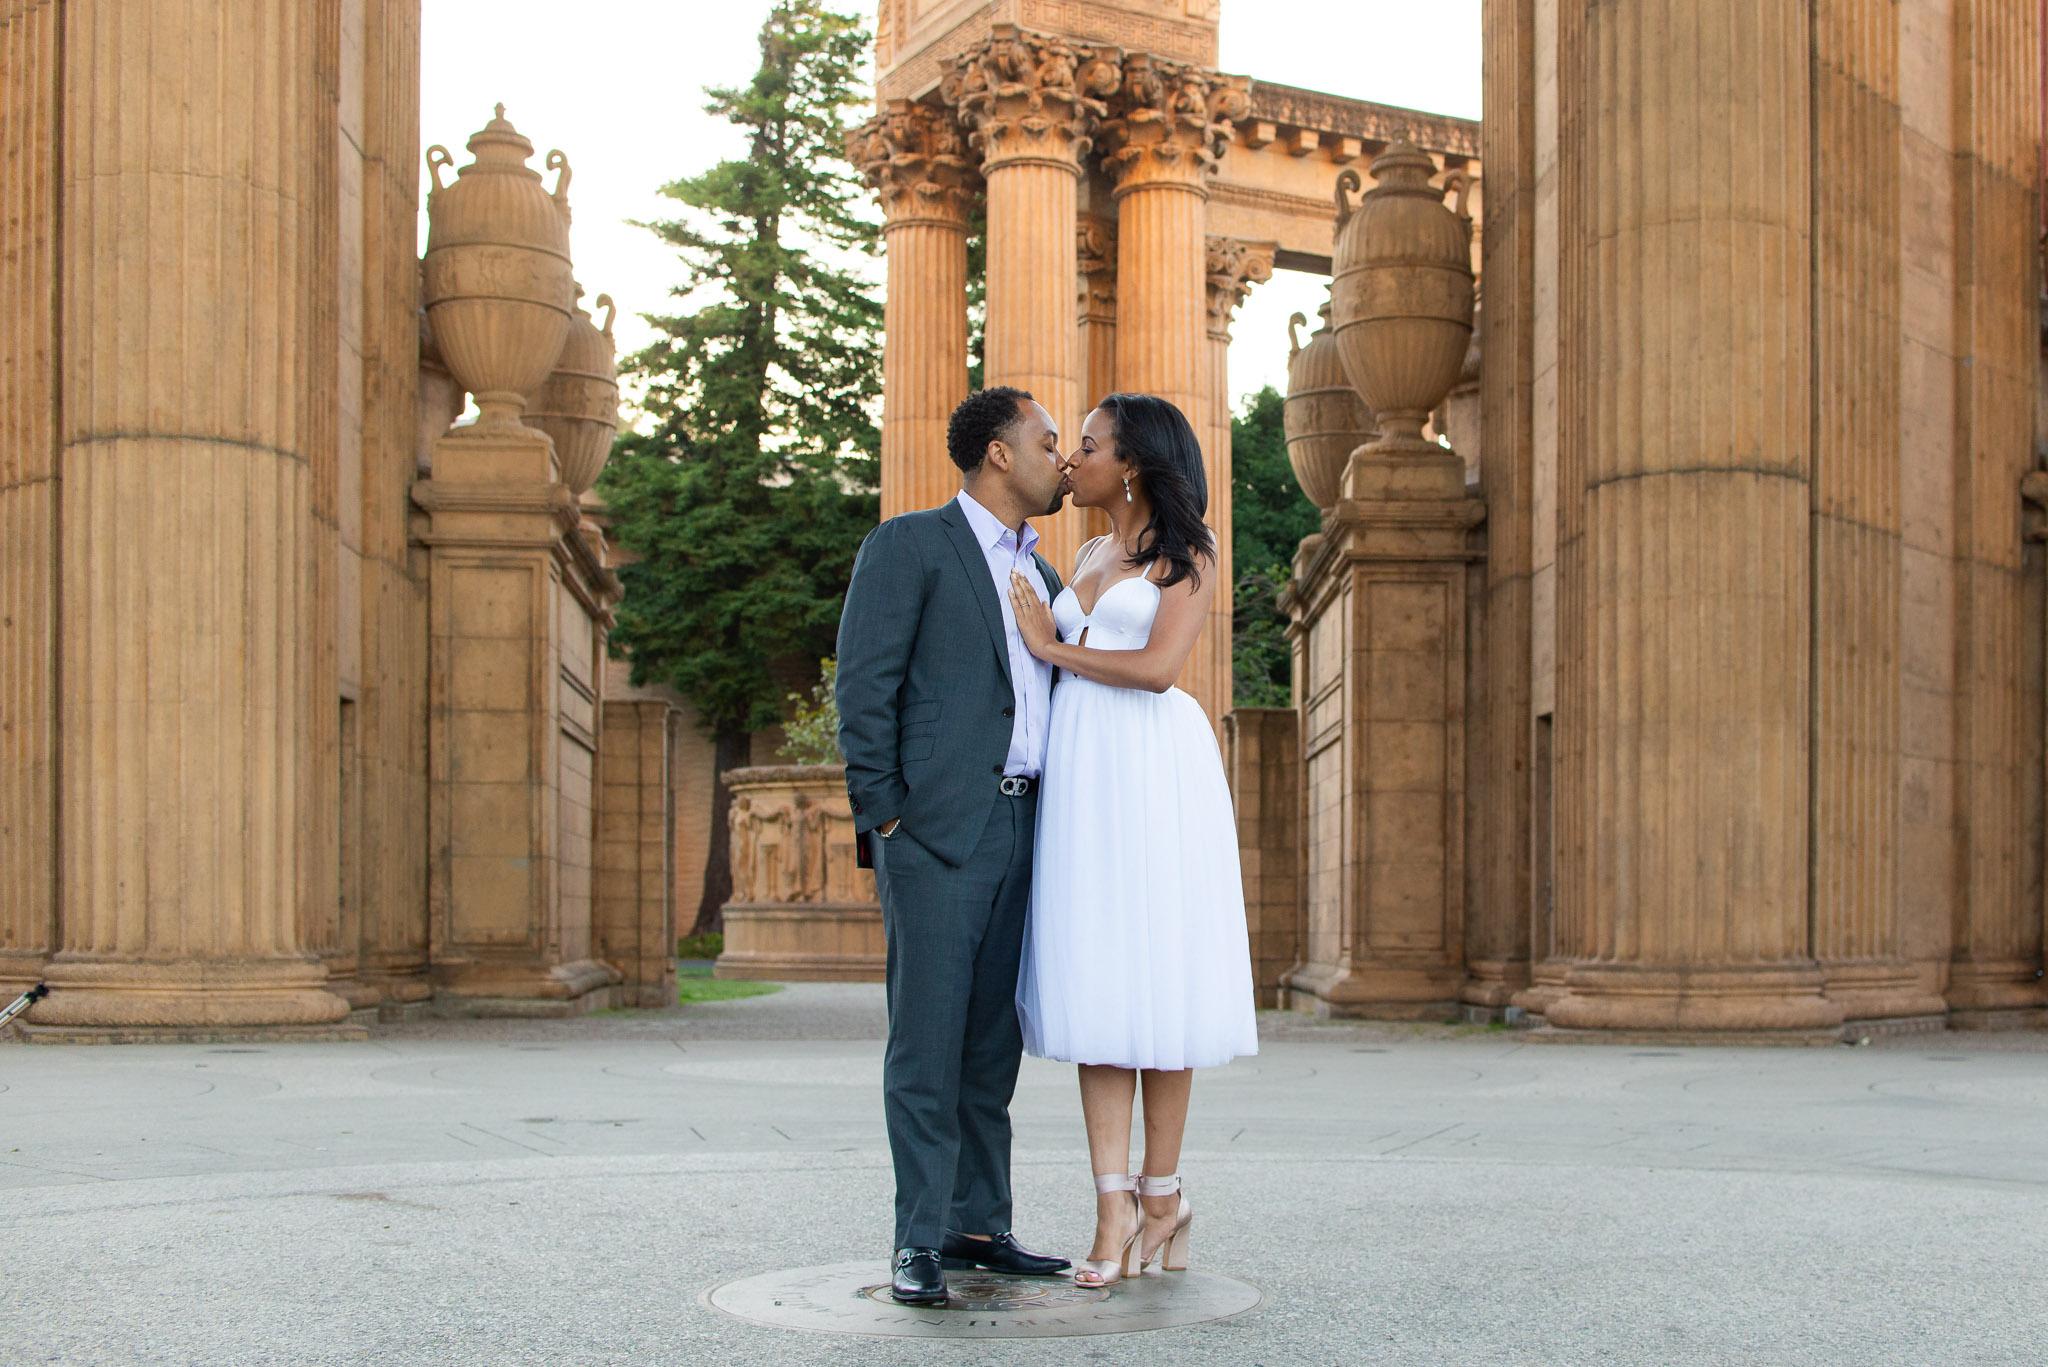 Elopement Engagement Photographer Orange County CA-21.jpg